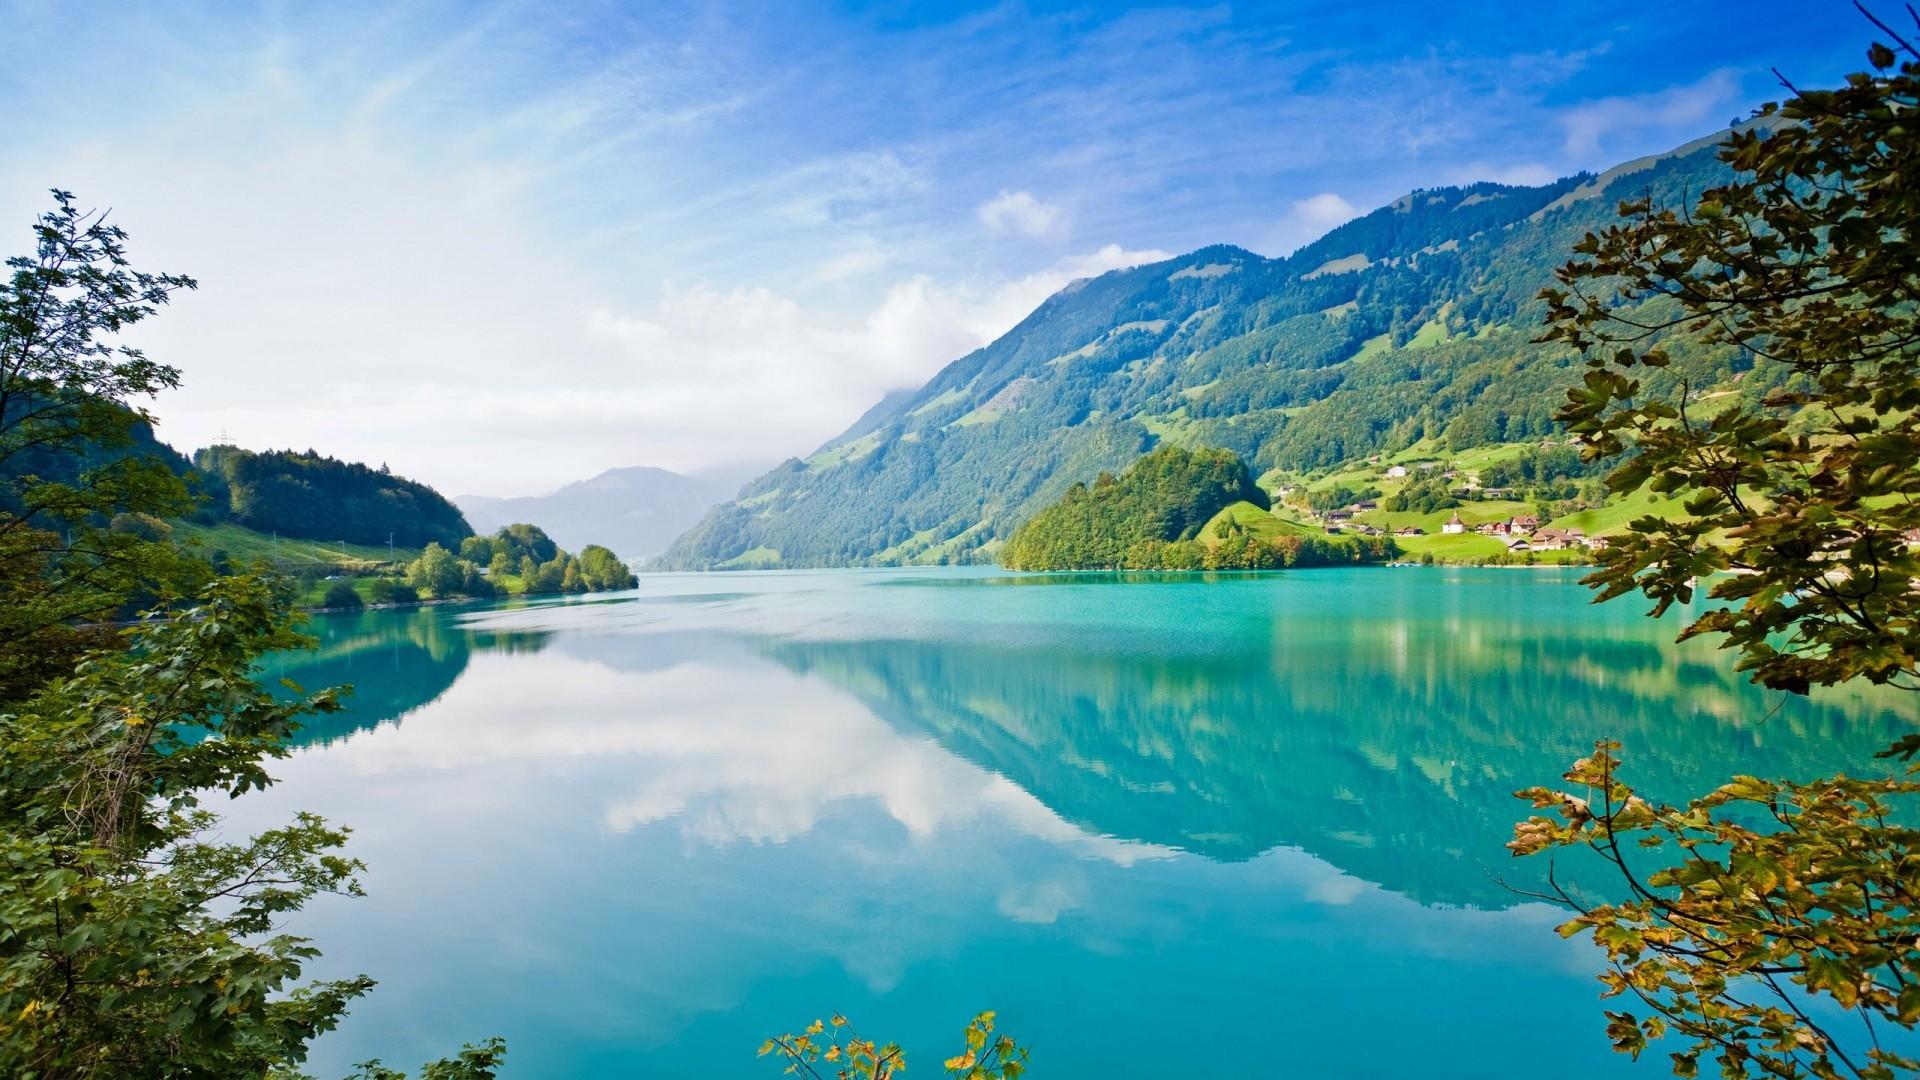 summer_mountains_nature_lake_river_grass